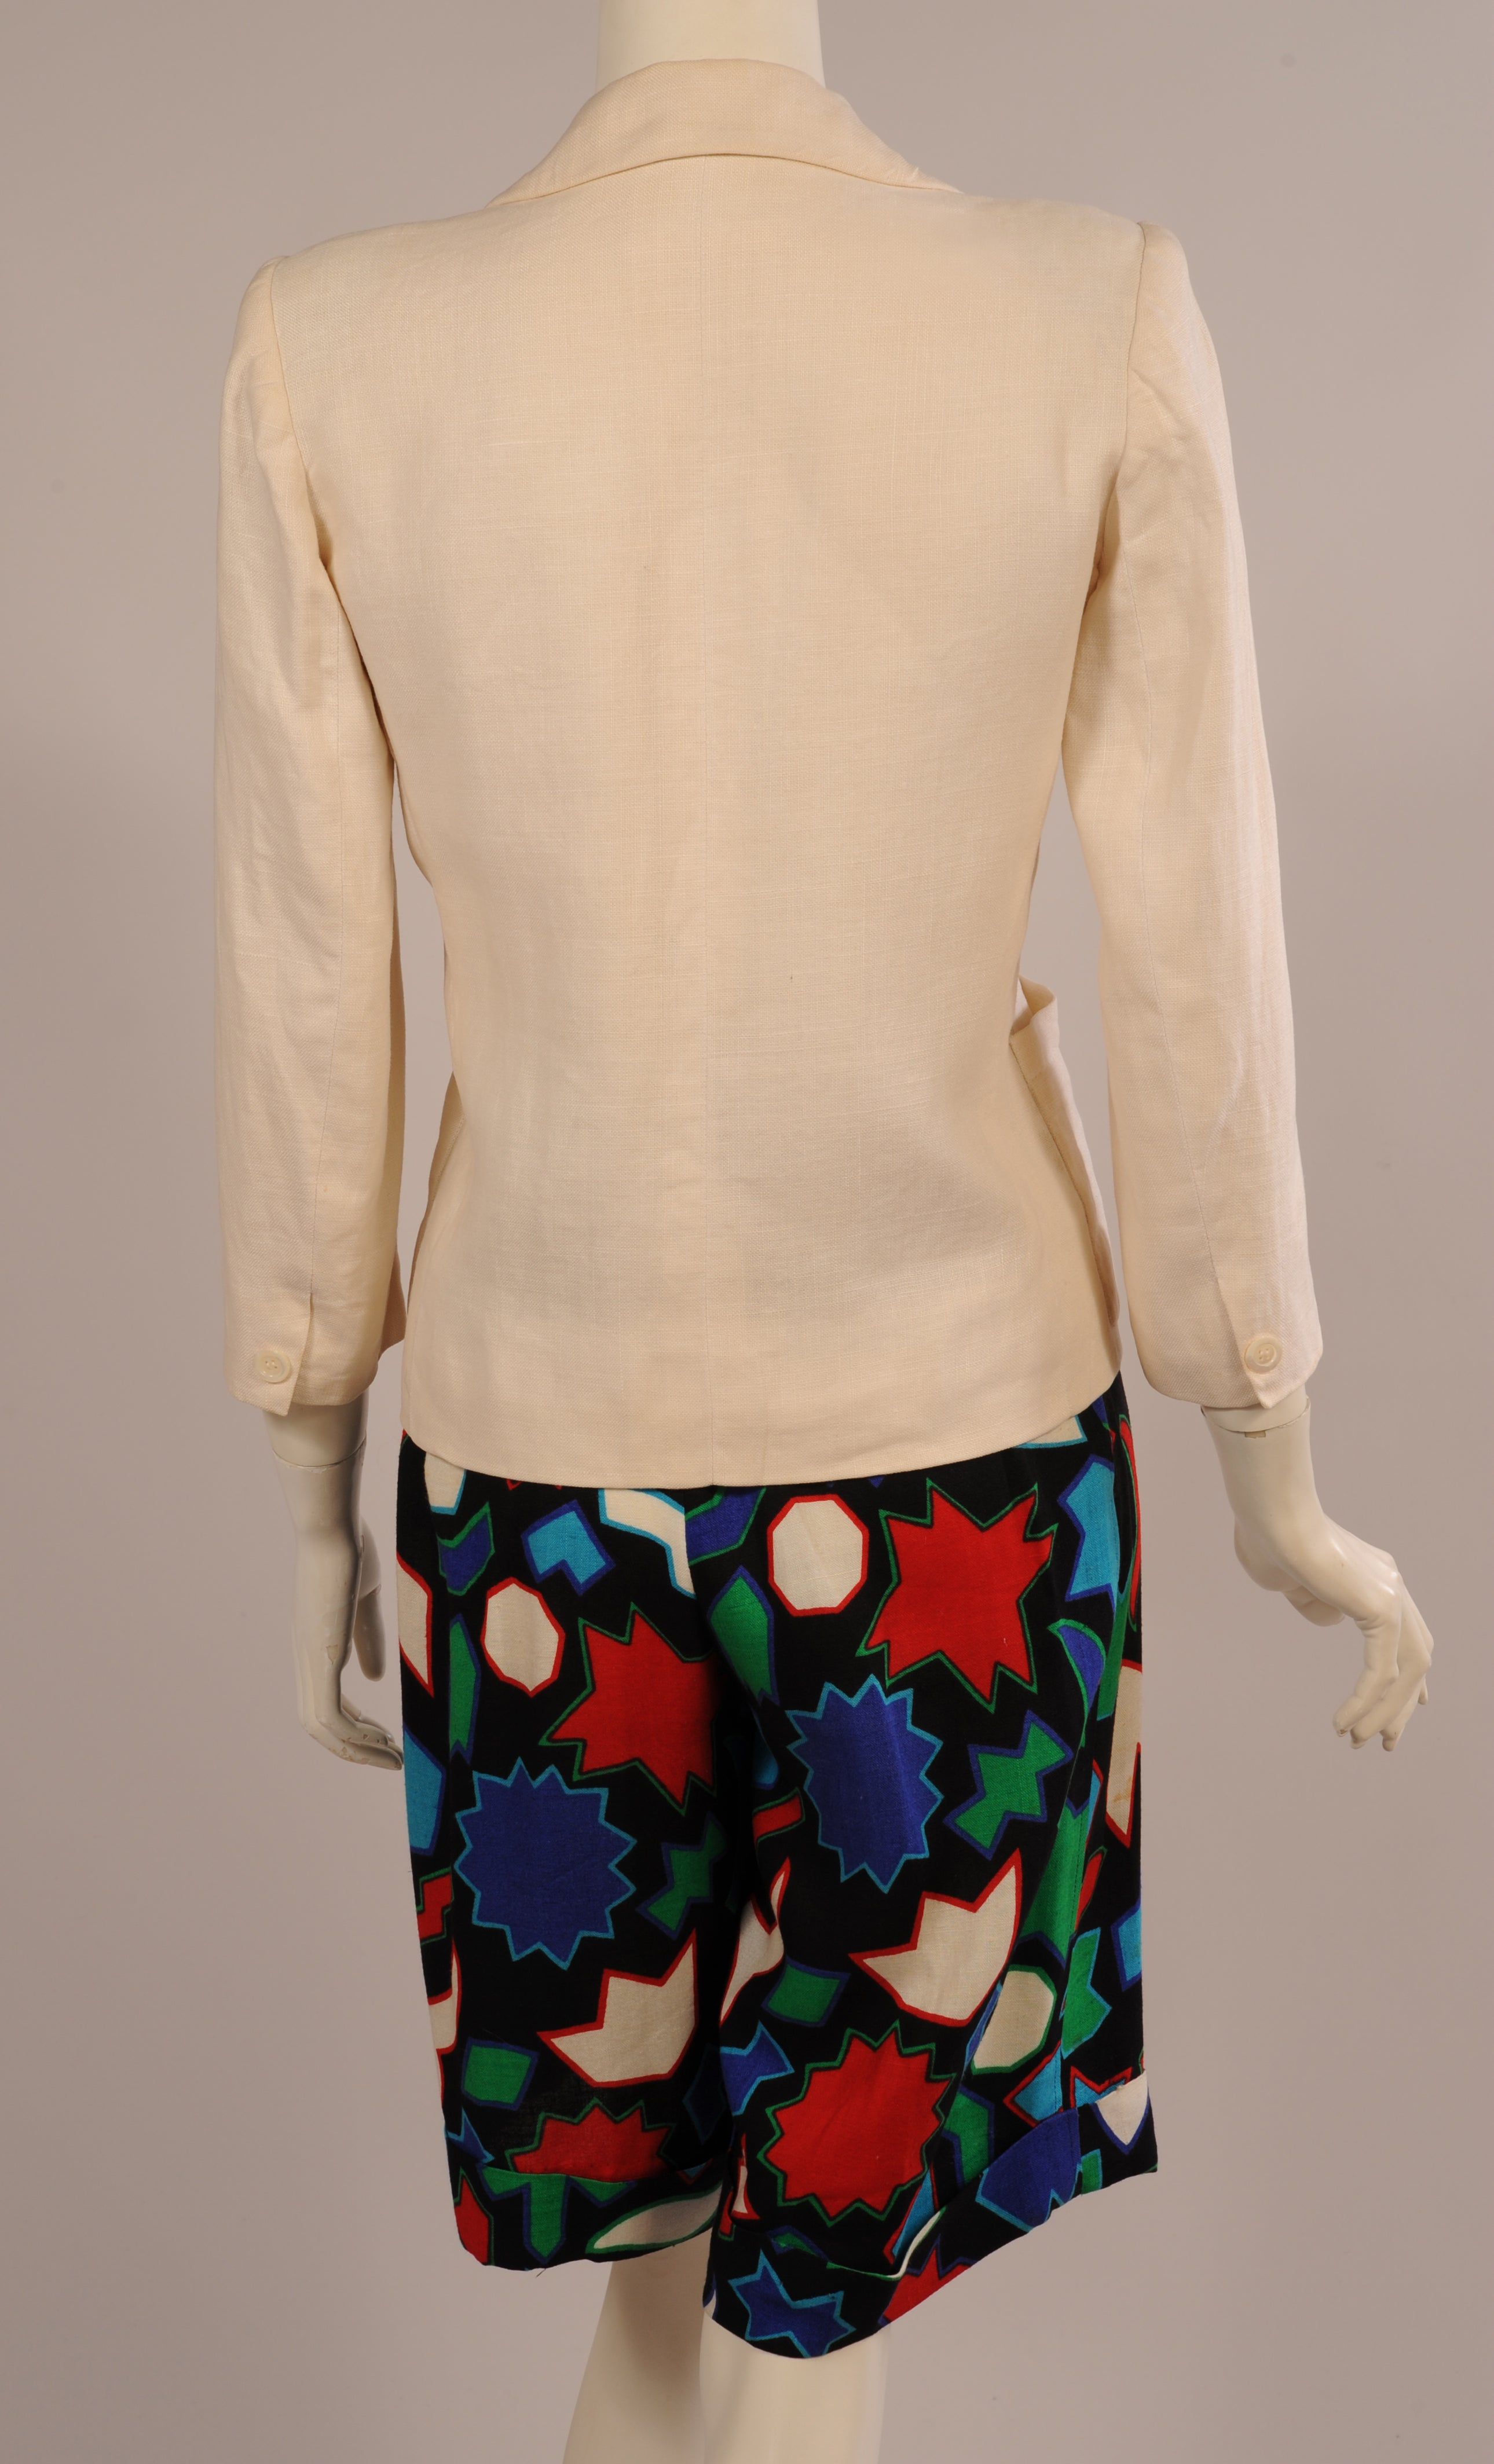 4ec283e279a Yves Saint Laurent White Linen Jacket and Printed Linen Shorts at 1stdibs